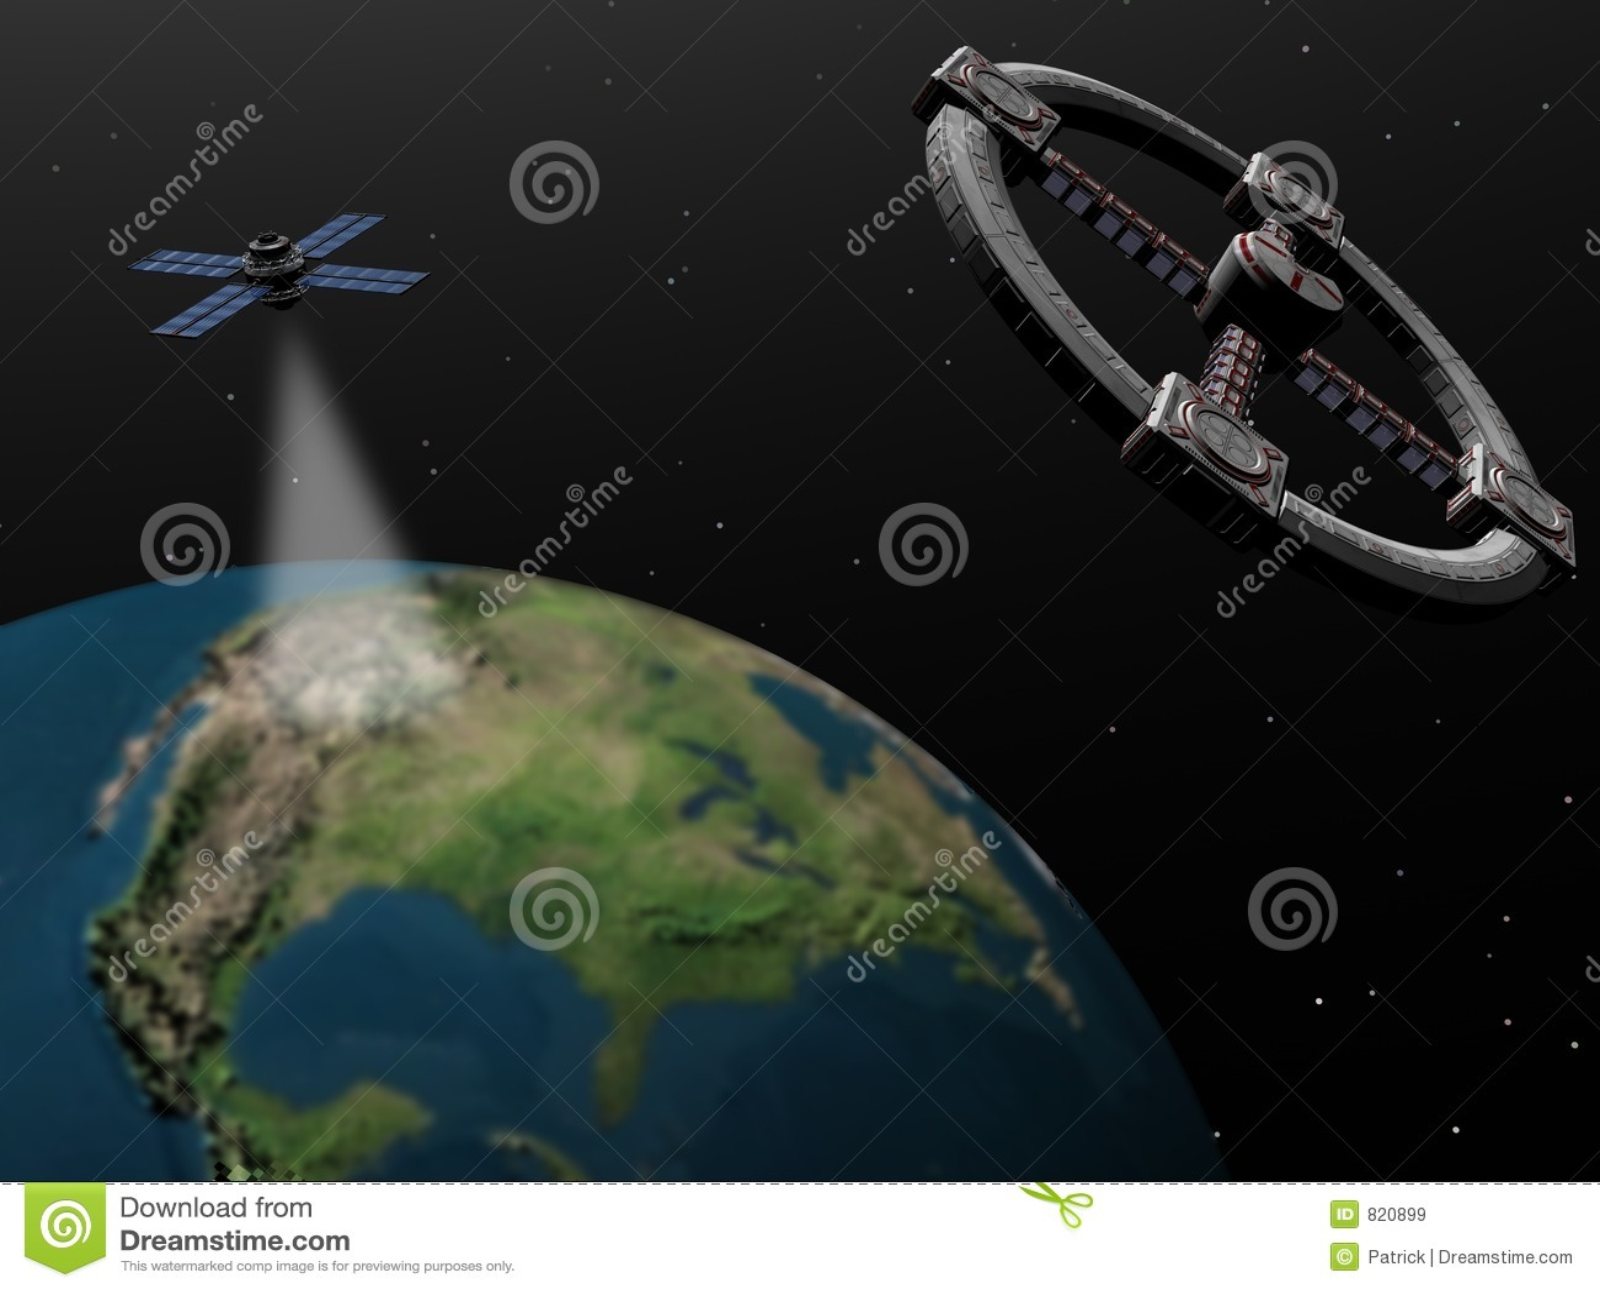 space exploration satellites - photo #23